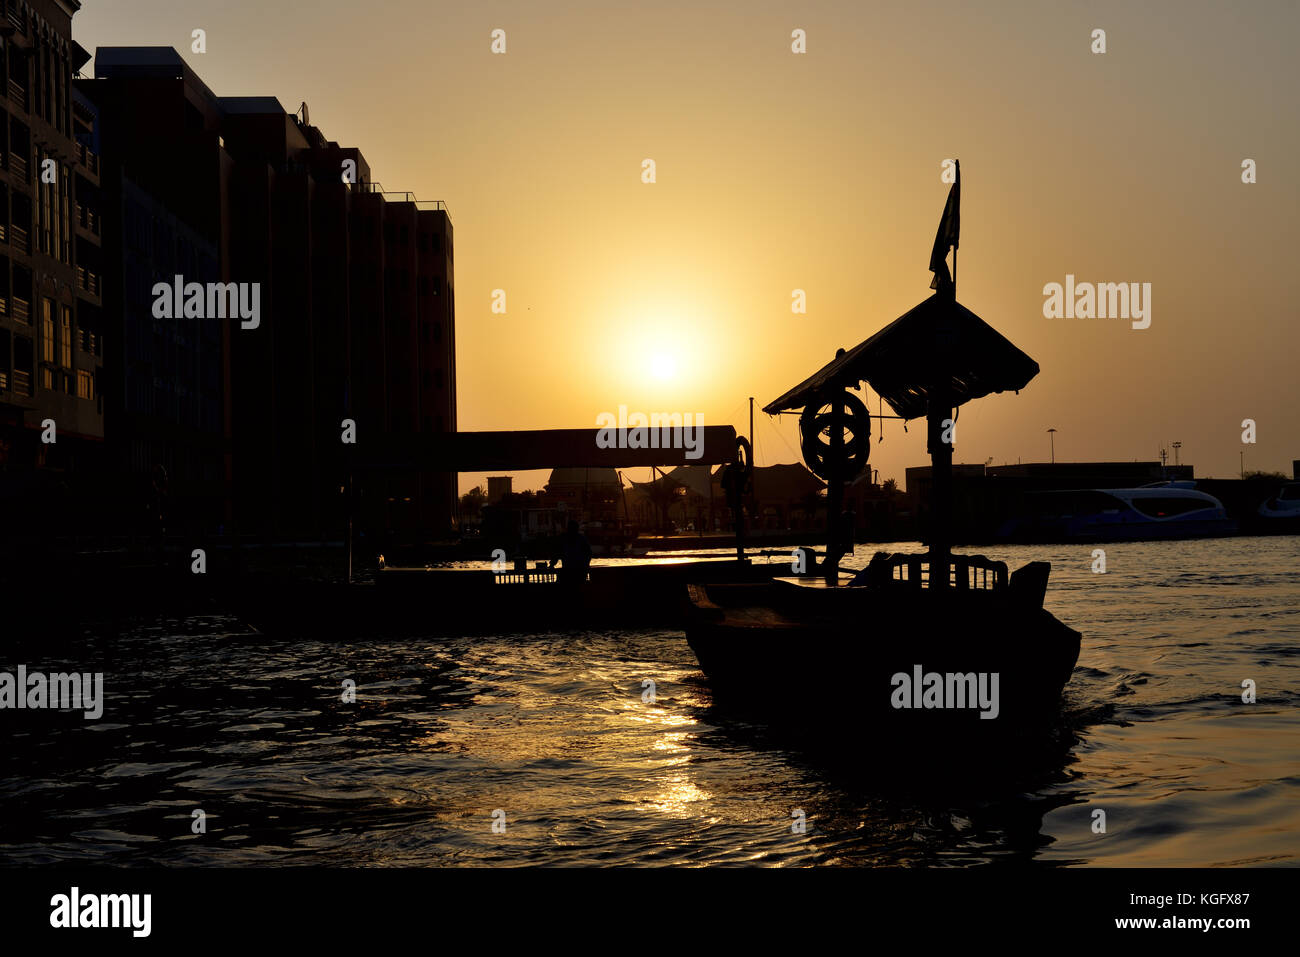 DUBAI, UAE - SEPTEMBER 10: The traditional Abra boat in